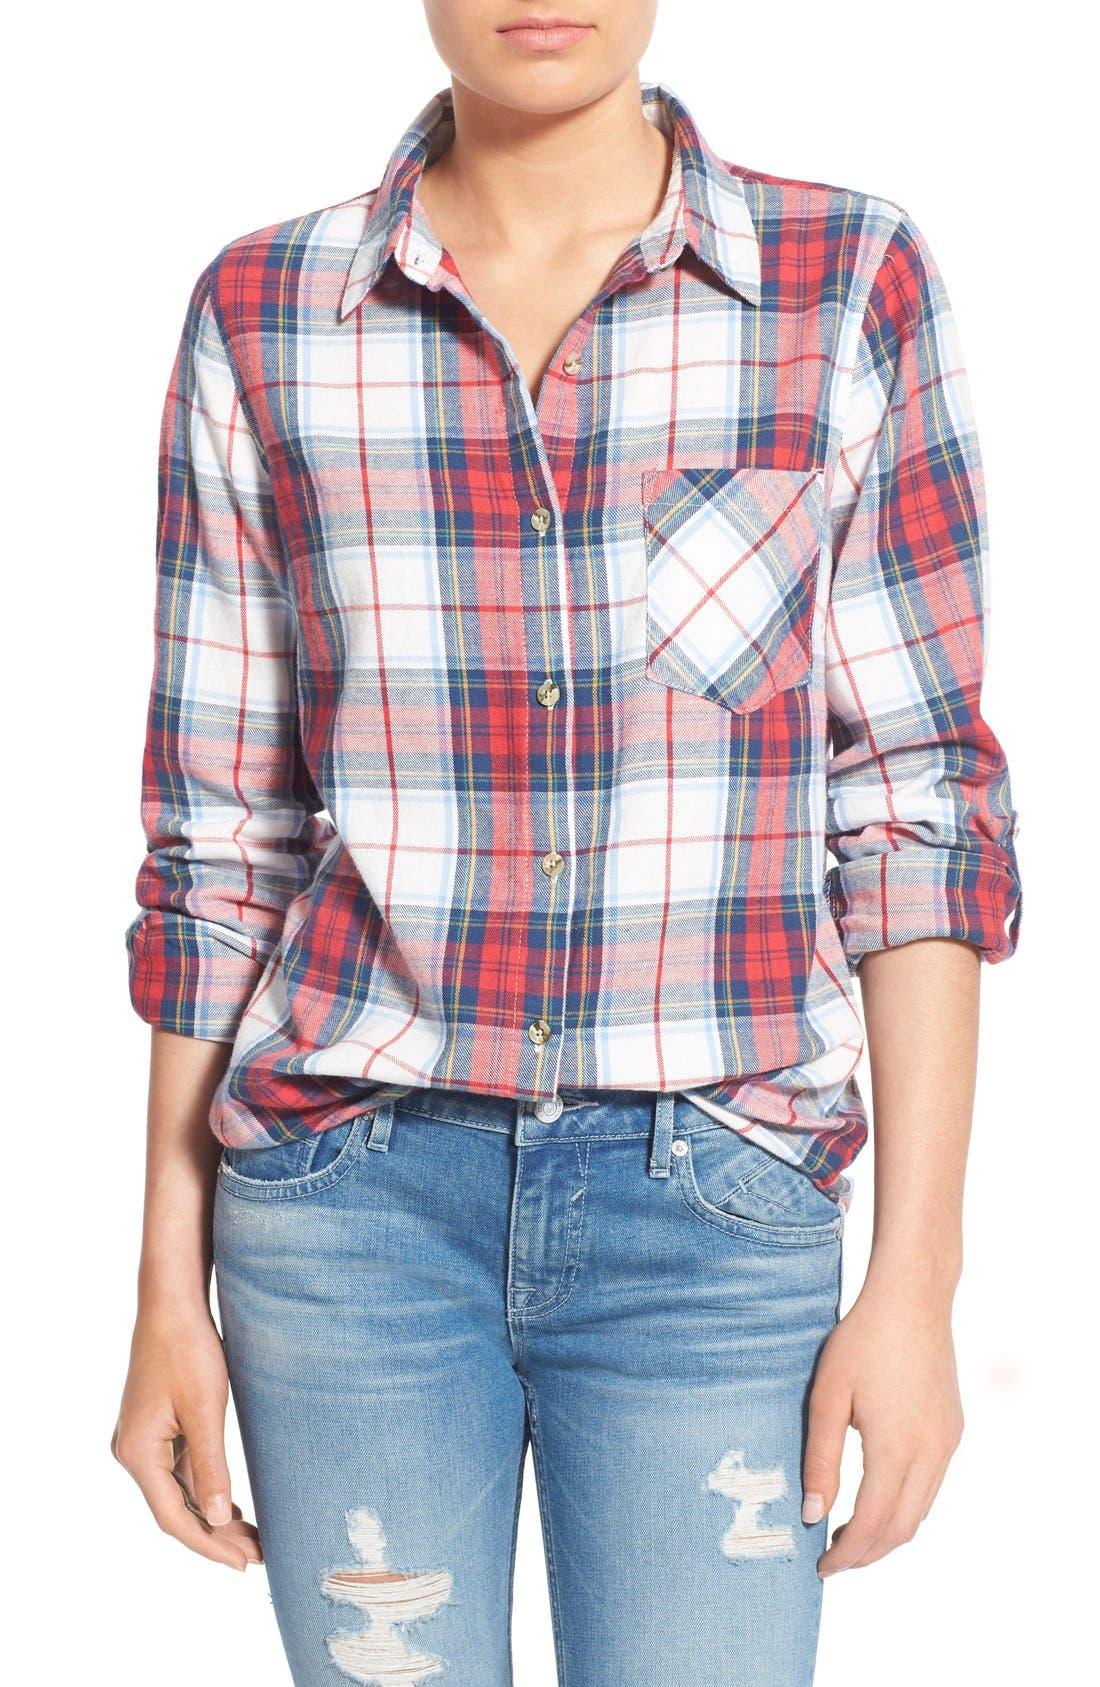 THREAD & SUPPLY 'Humboldt' Plaid Shirt, Main, color, 600